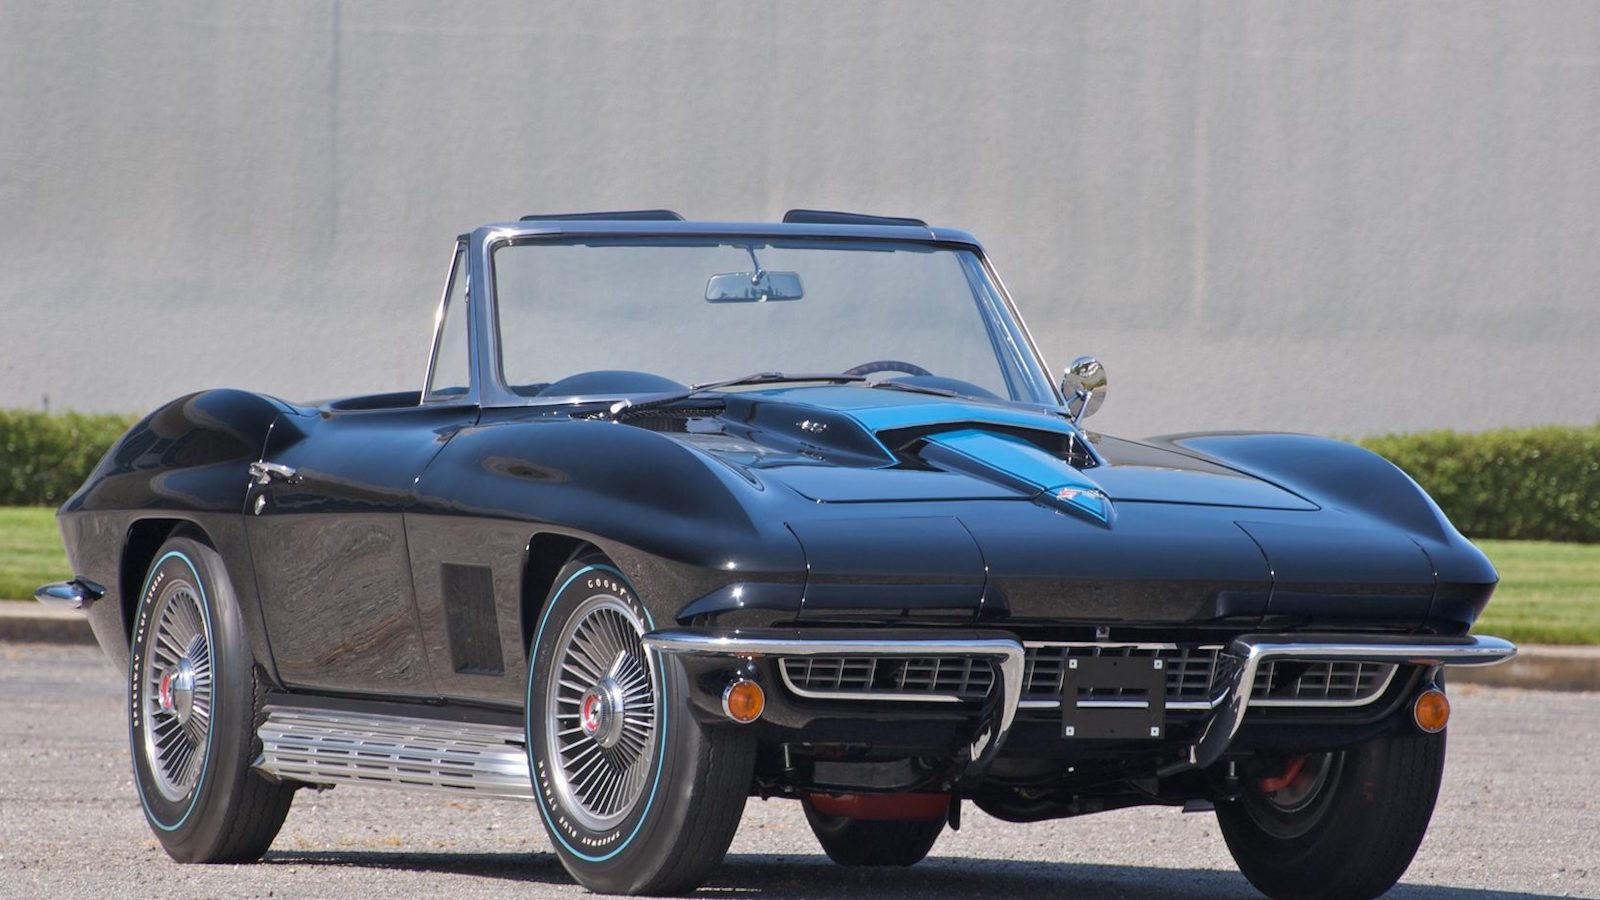 1967 Chevrolet Corvette L-88